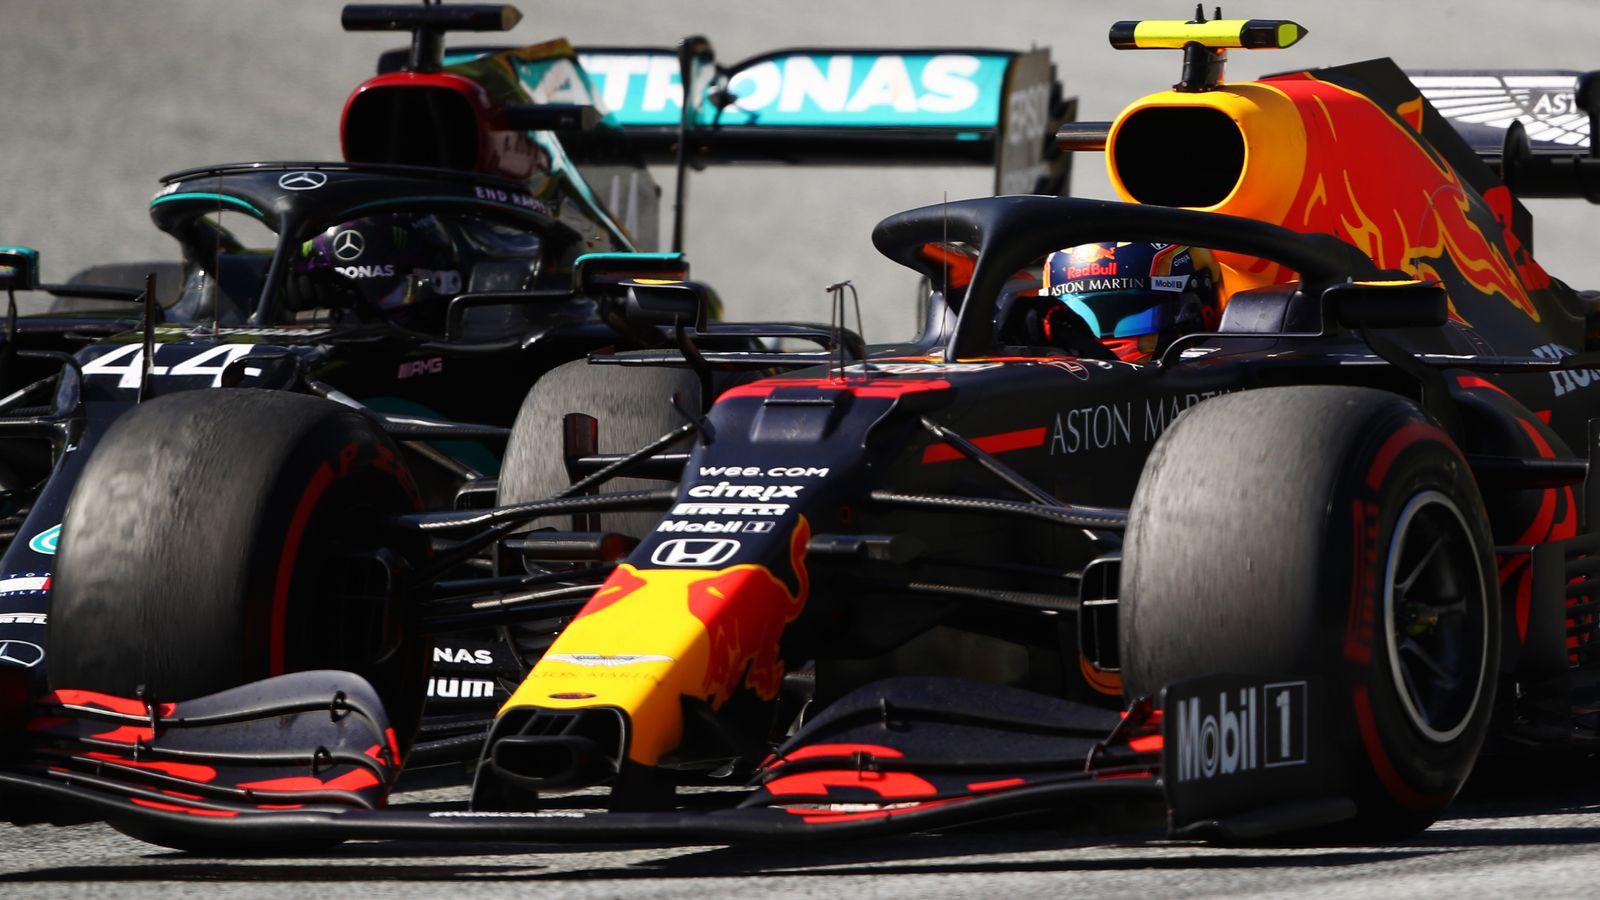 Hamilton on Albon crash: Racing